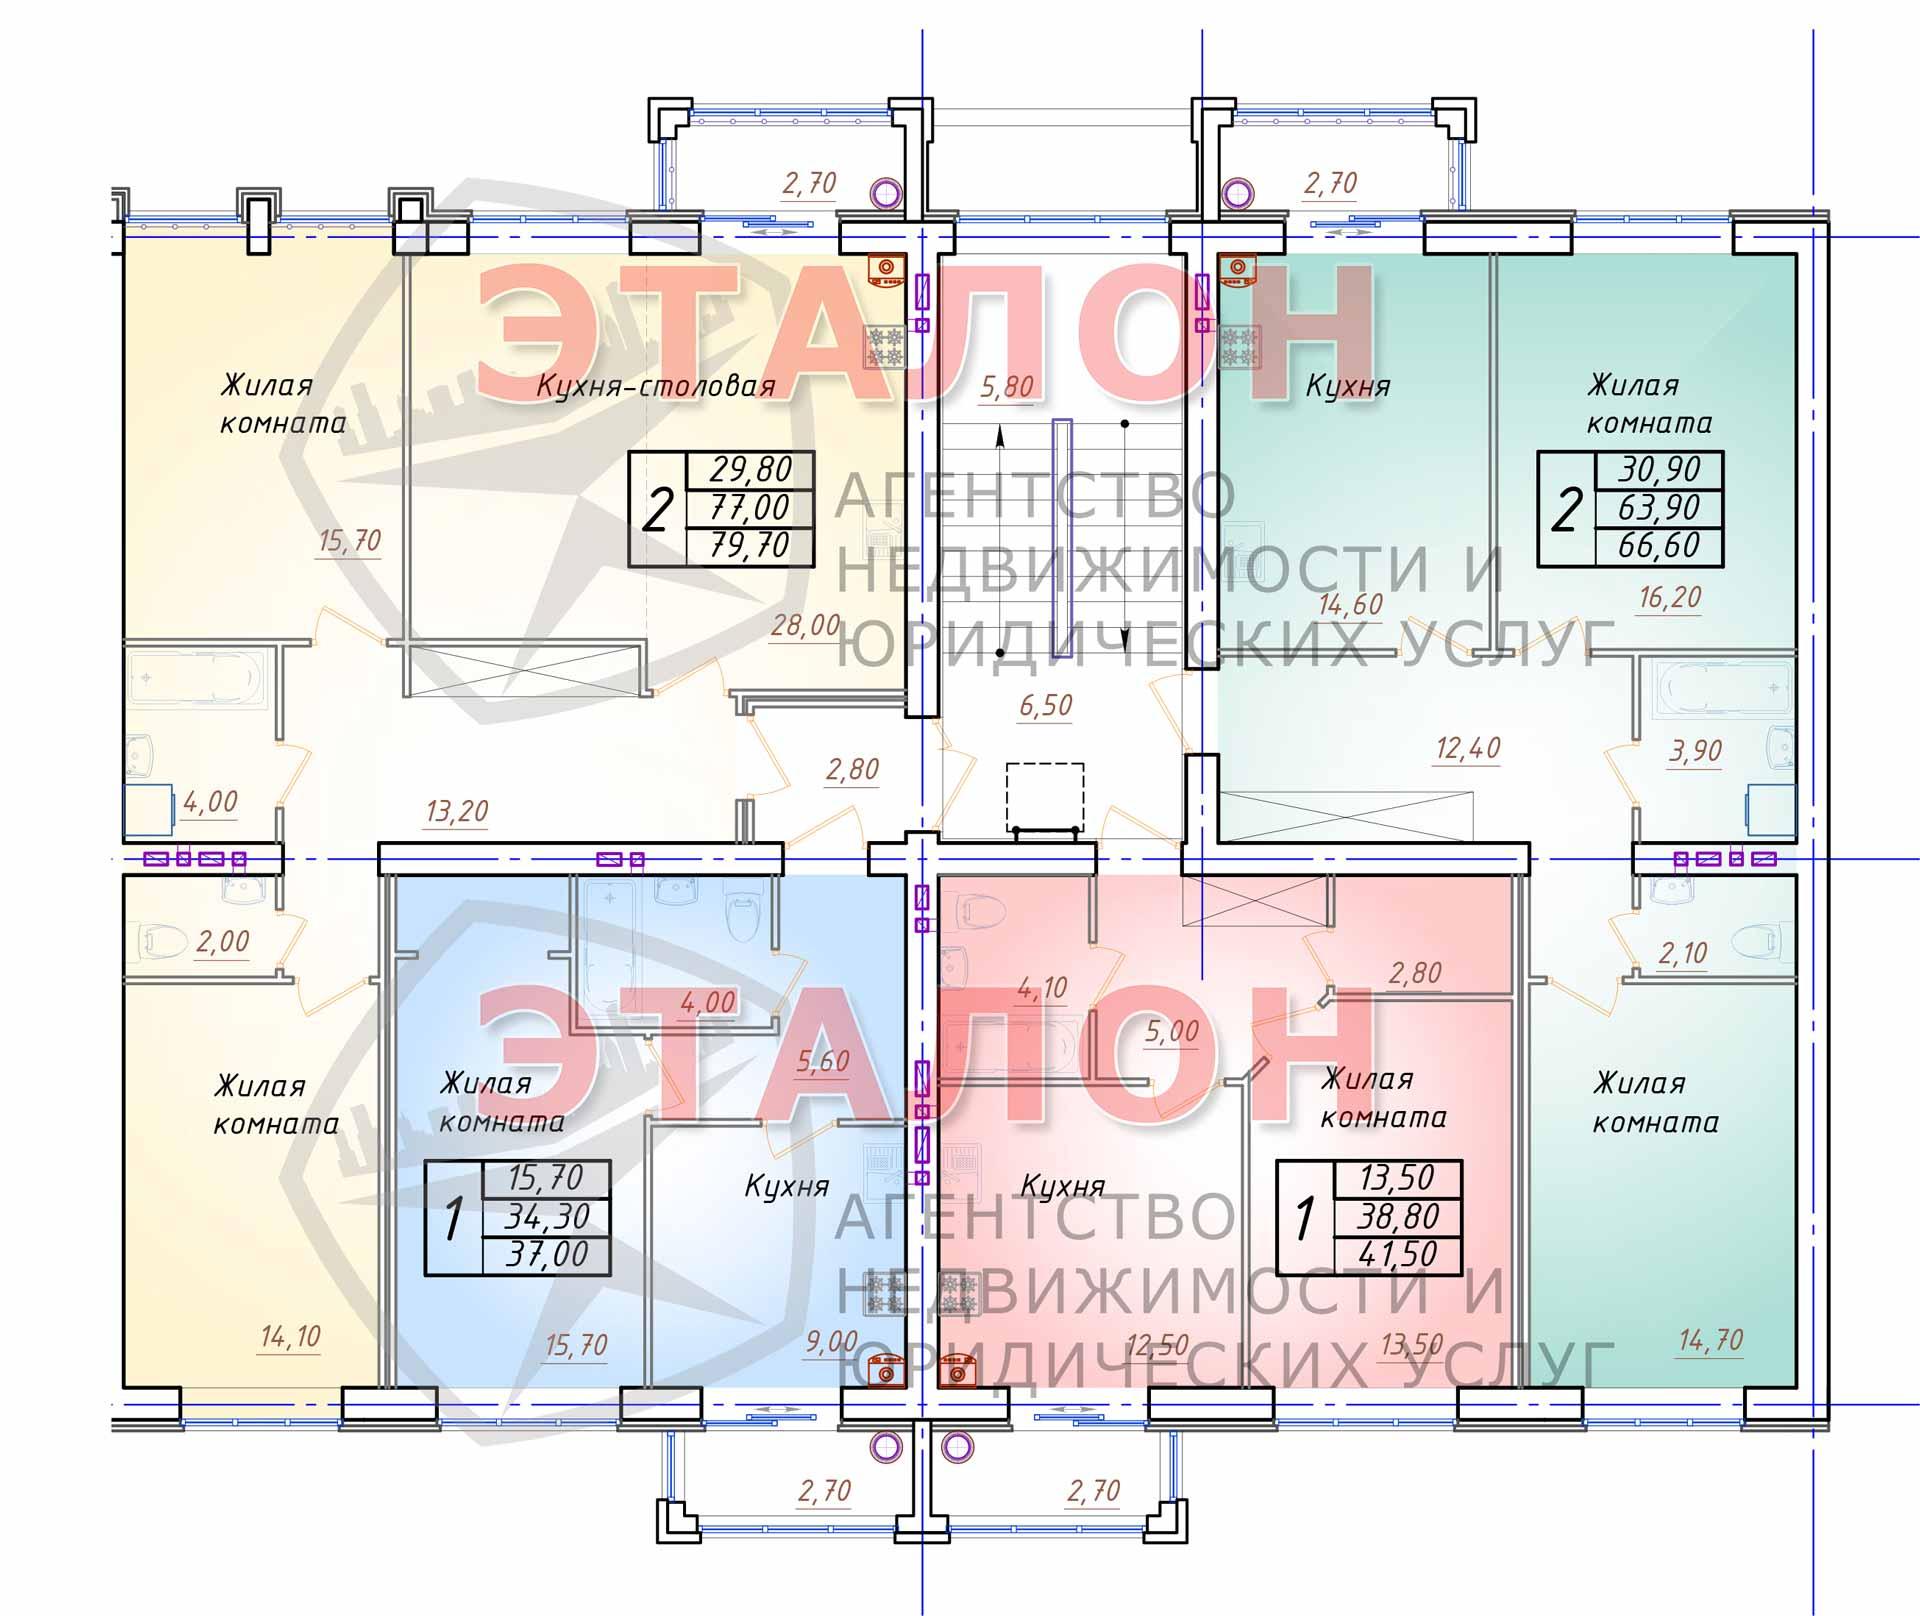 Блок 4. Подъезд 5. План 2-4-го этажа